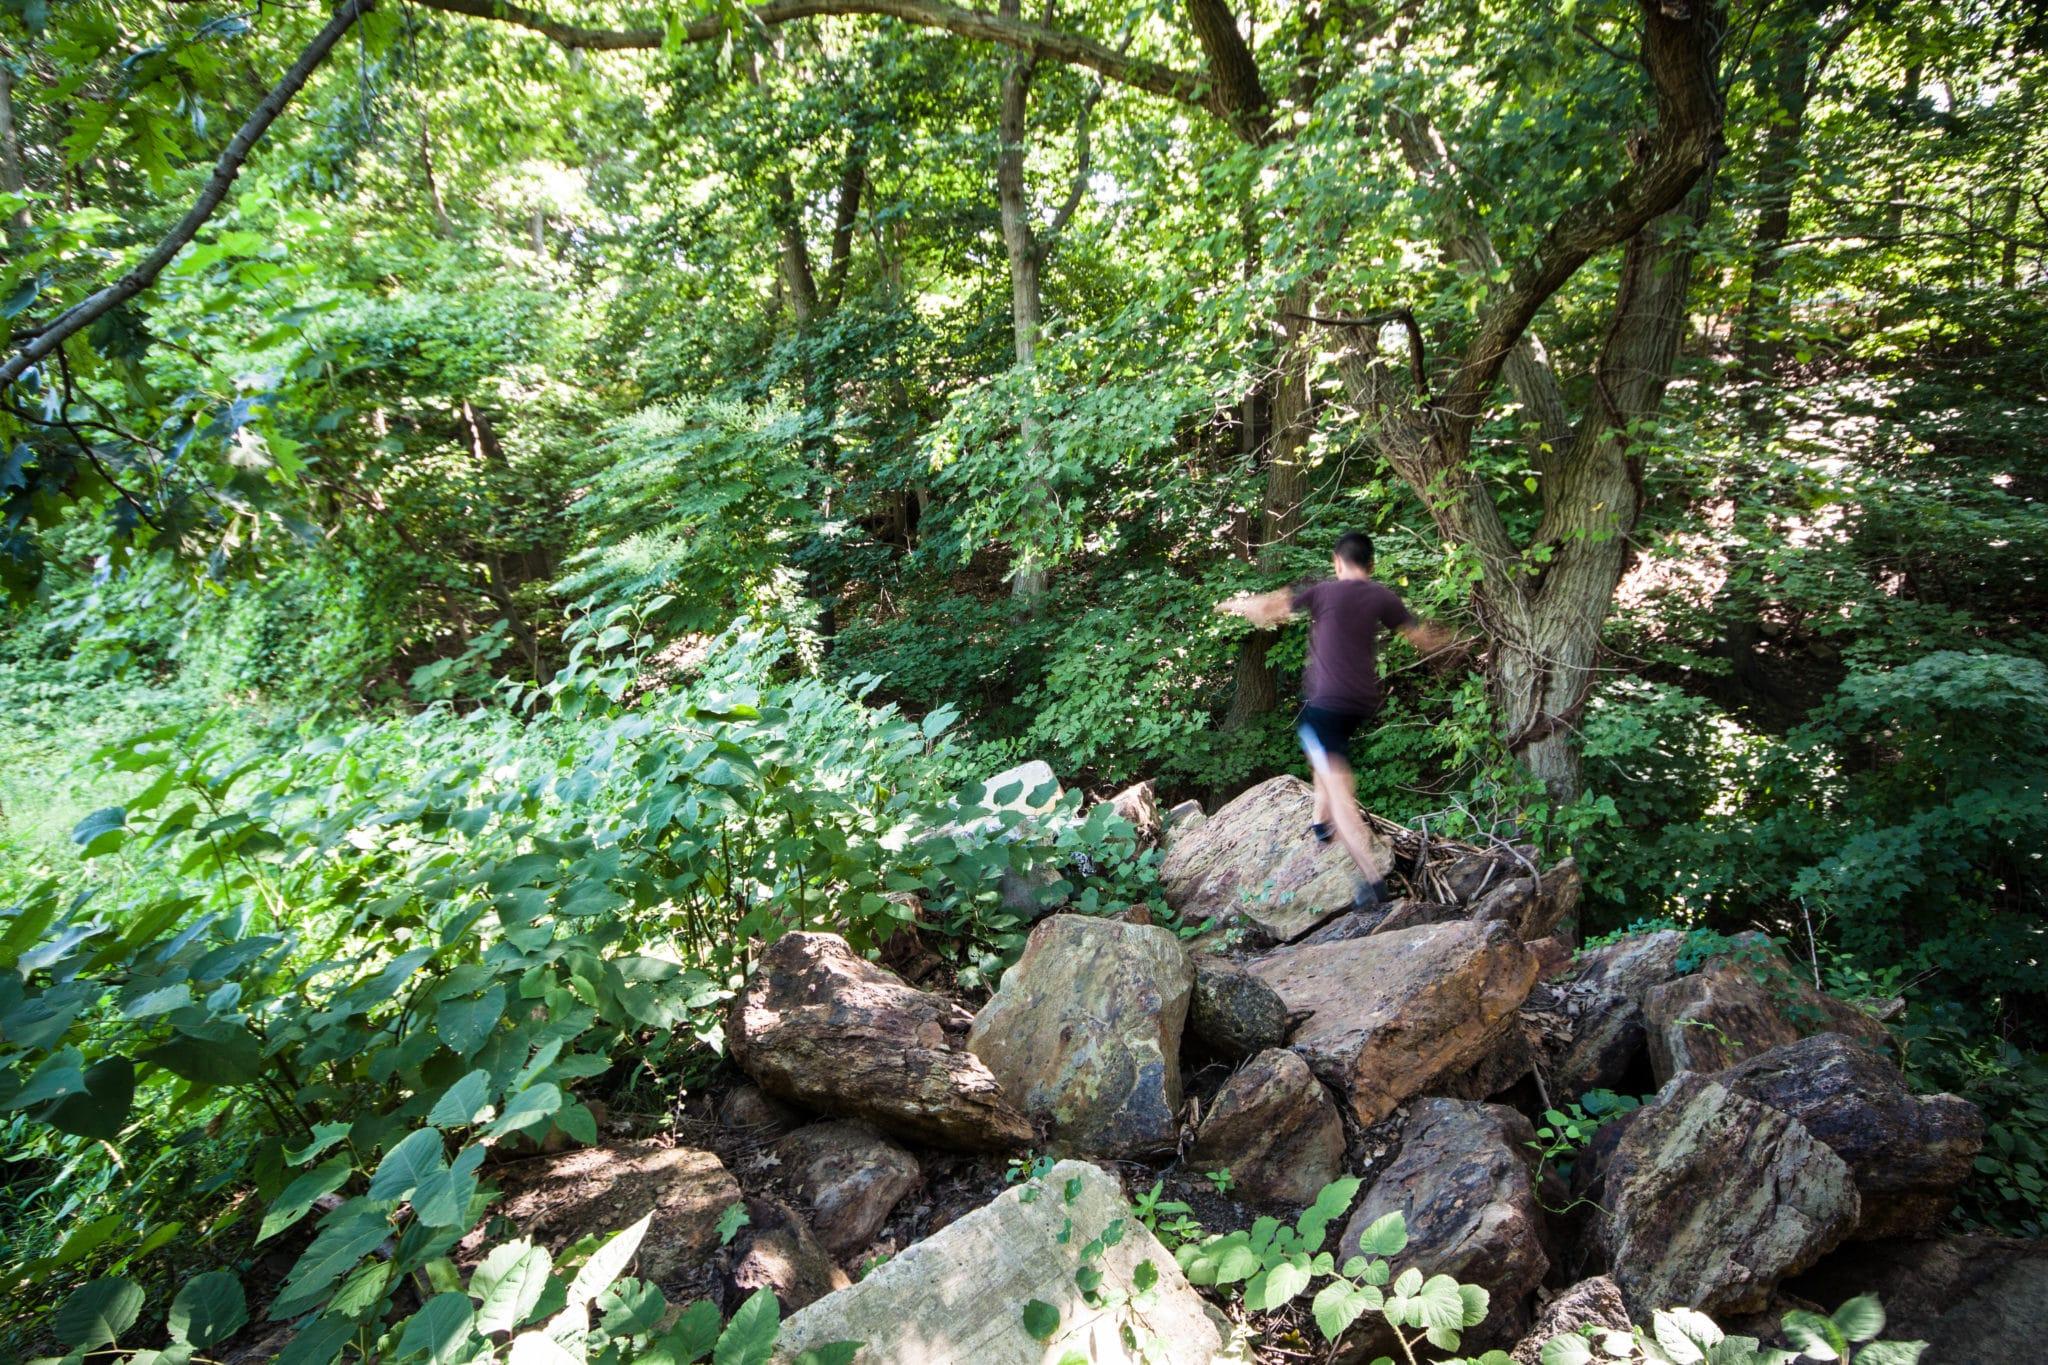 A young man hiking on Heths Run rocks